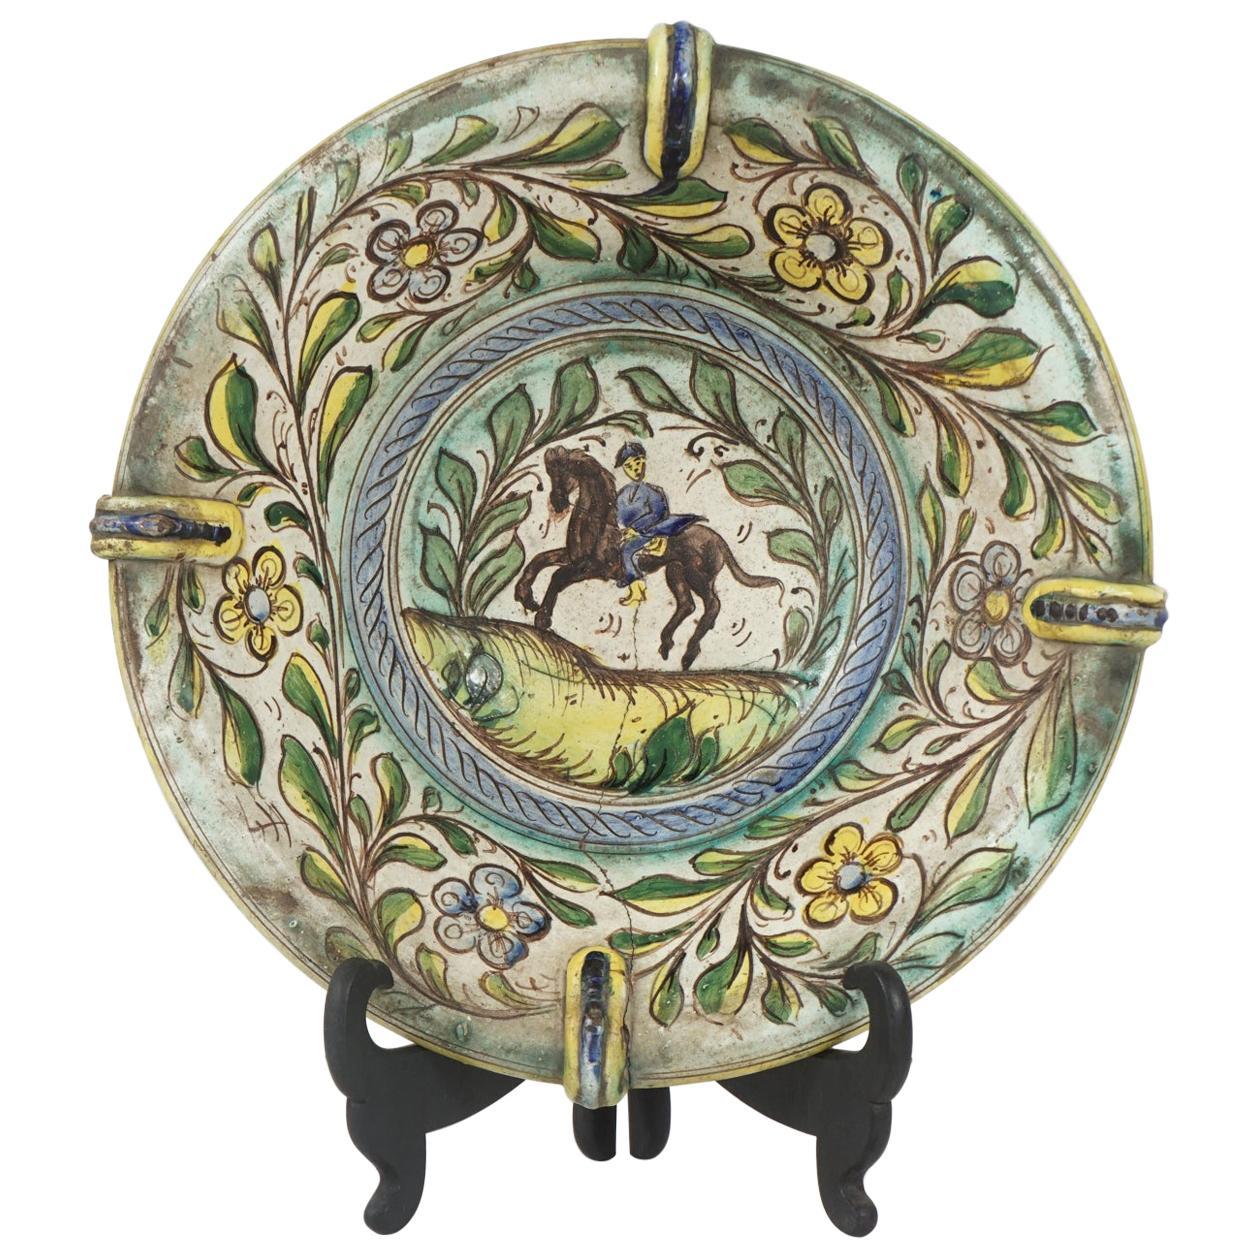 Late 17th-Early 18th Century Italian Majolica Bowl